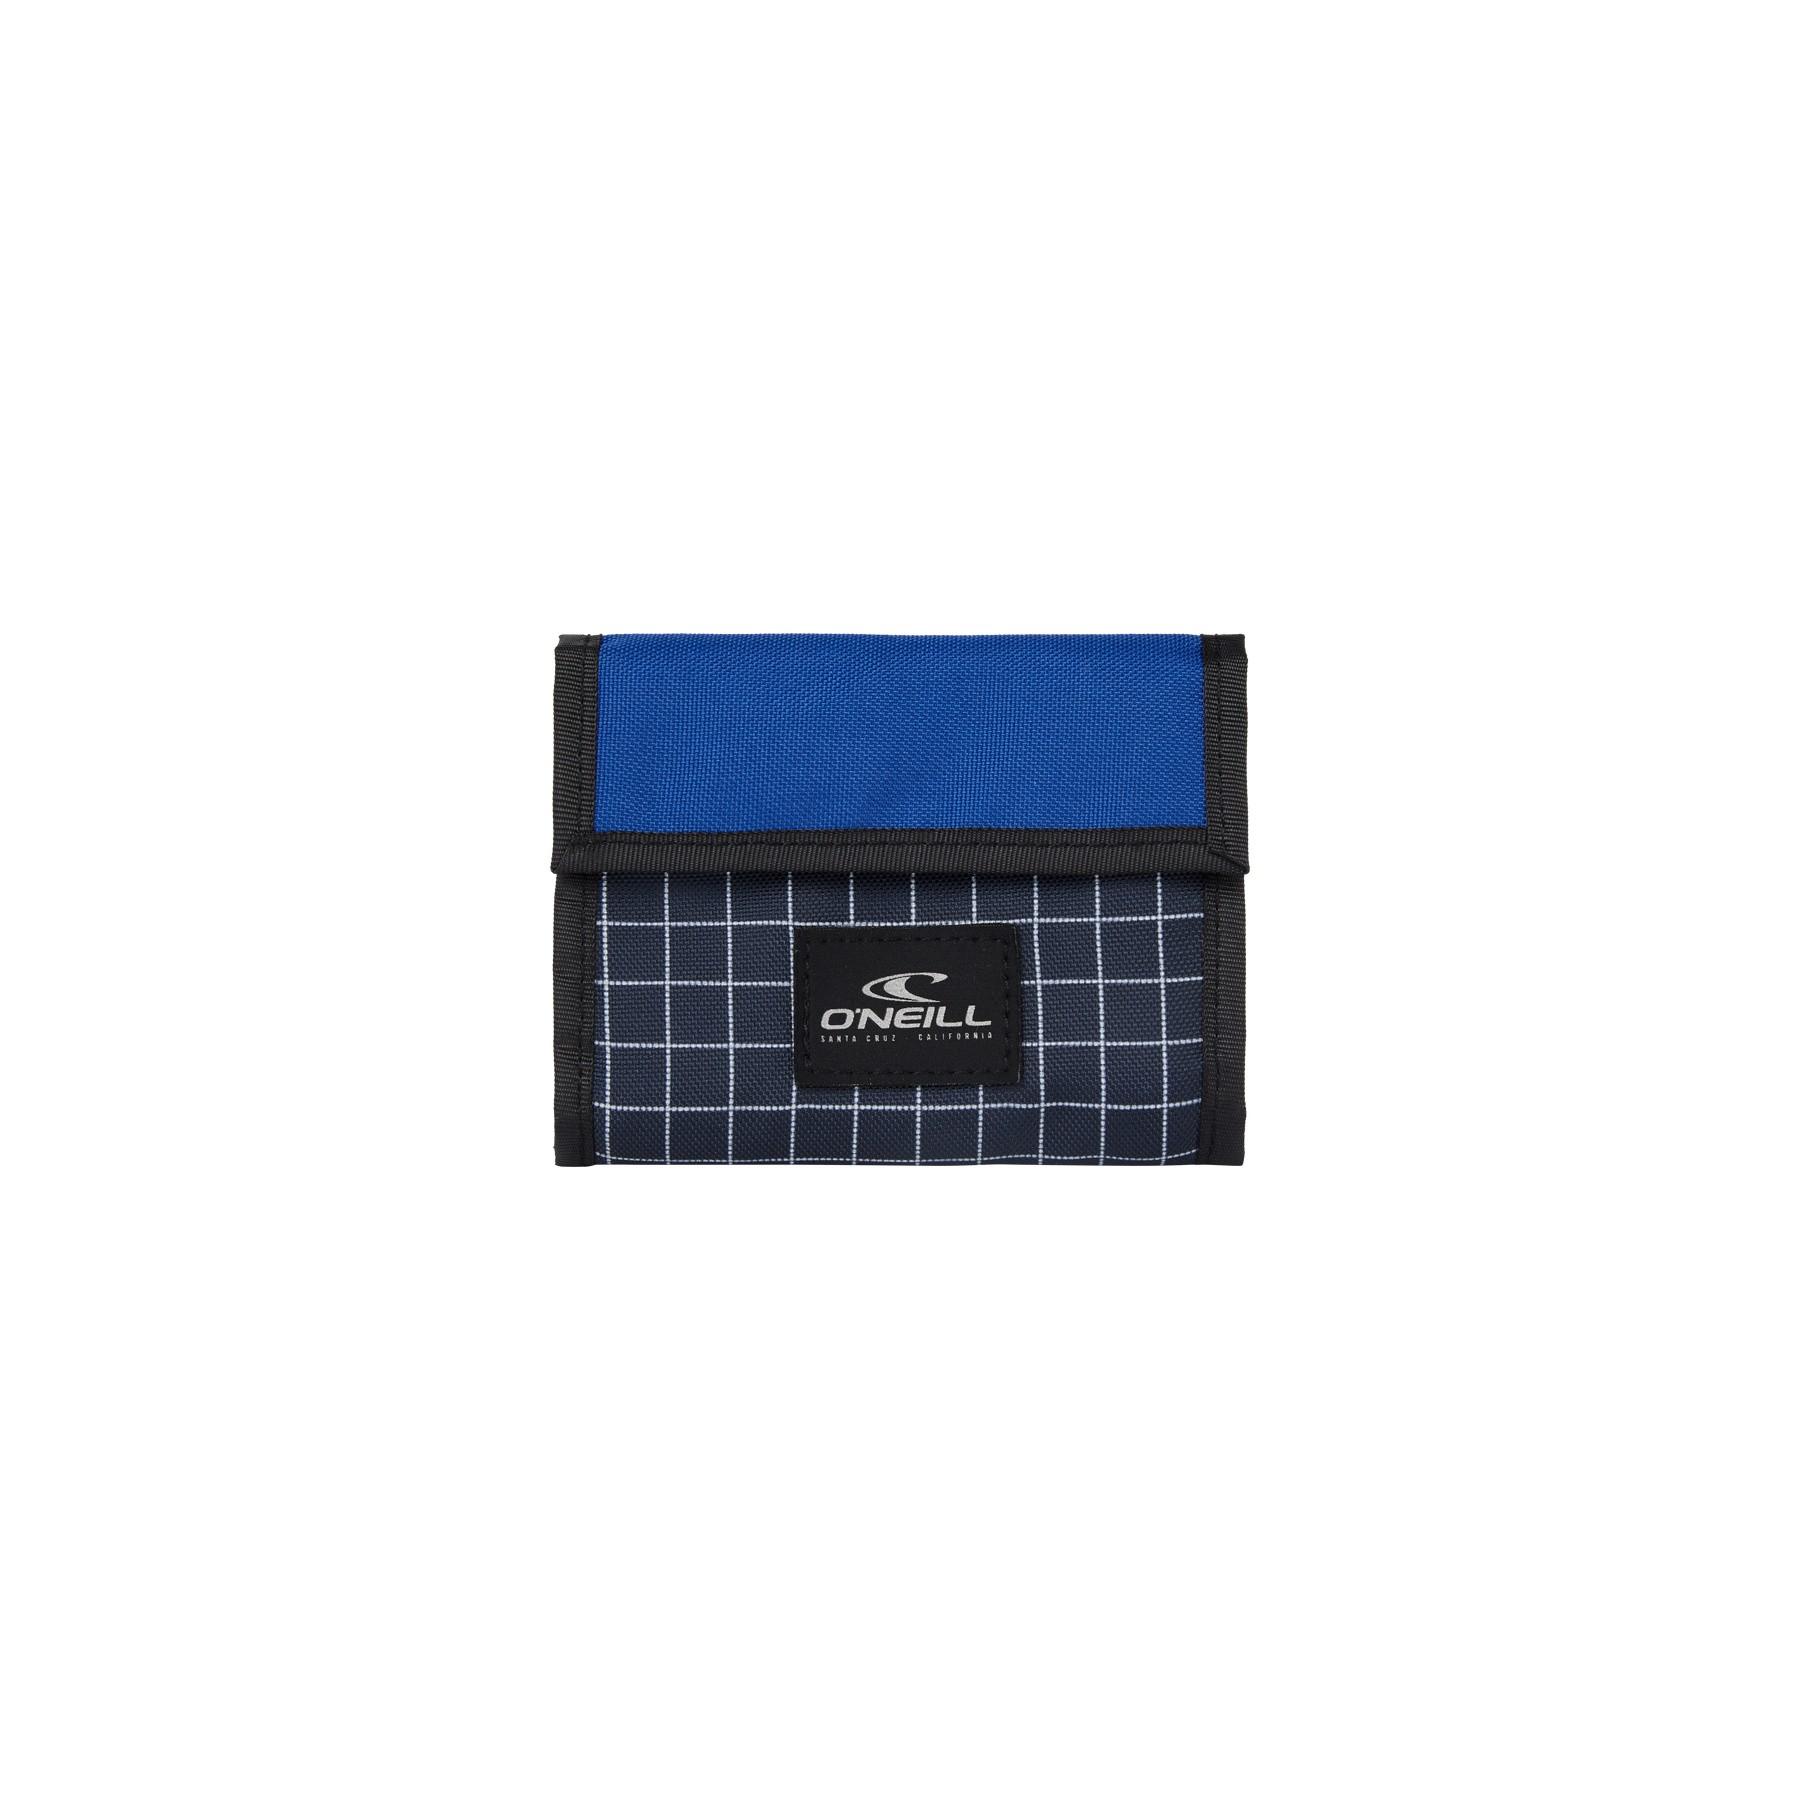 O'Neill Pocketbook Wallet 5910 Blue AOP